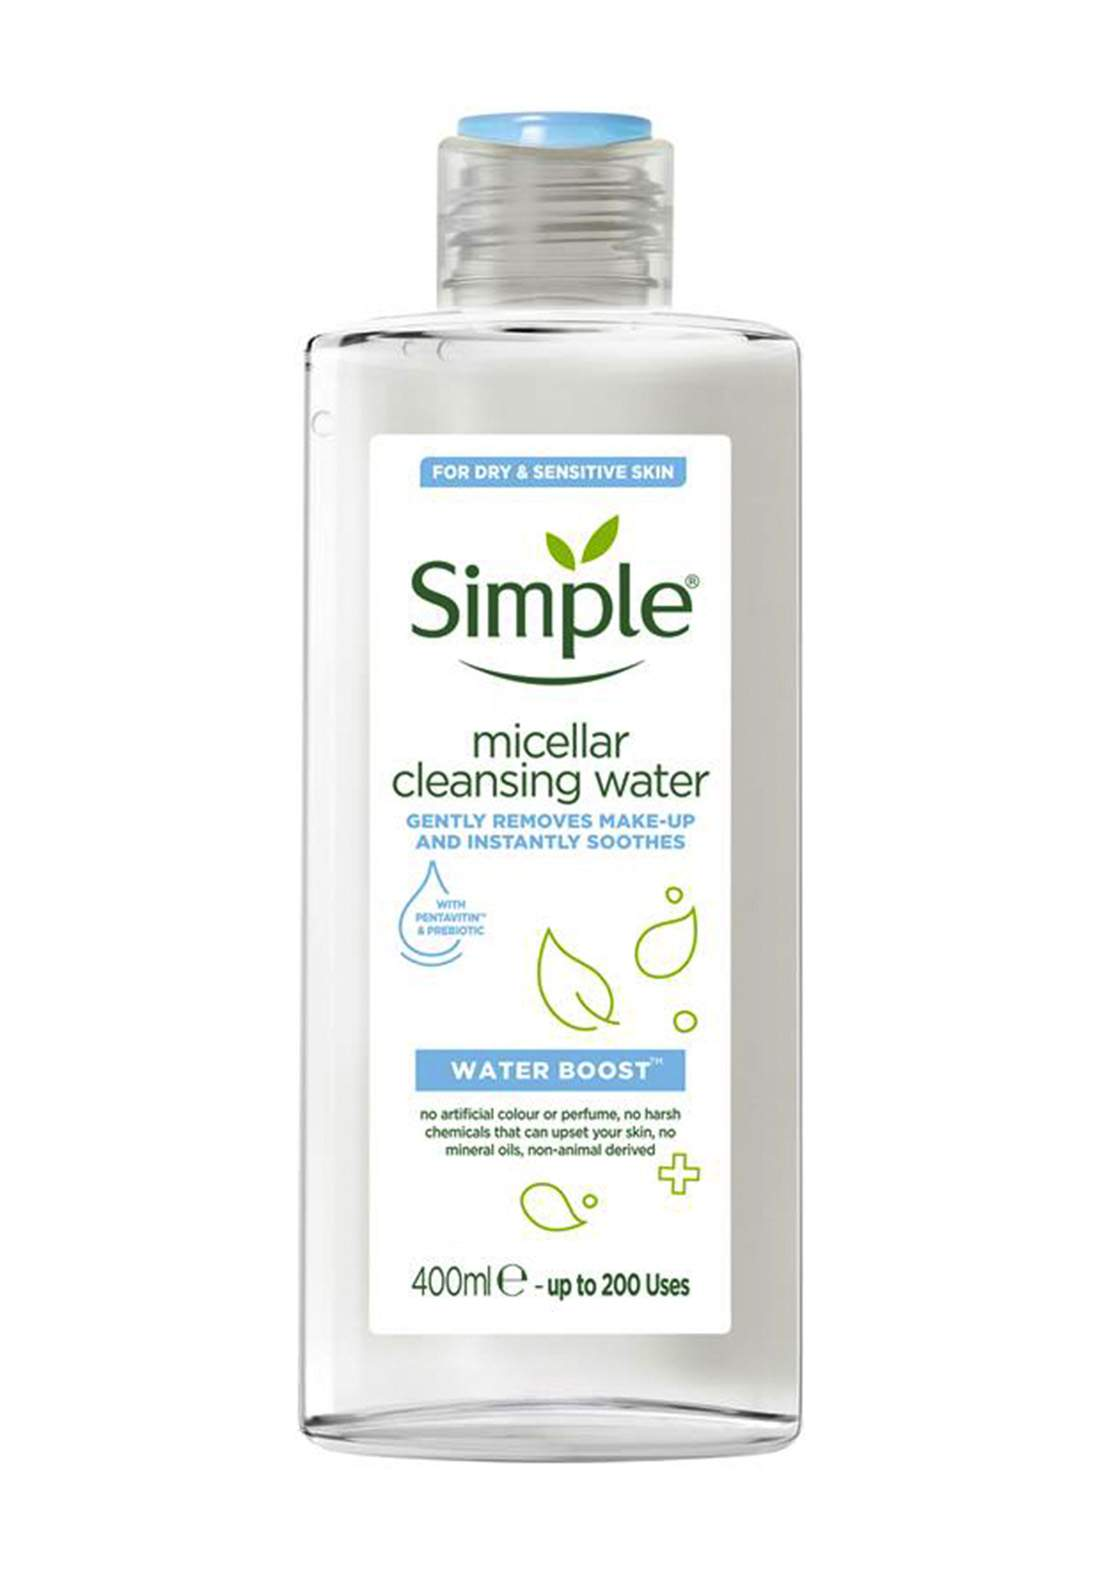 Simple (027941) Water Boost Micellar Cleansing Water 400ml ماء ميسلار منظف للوجه